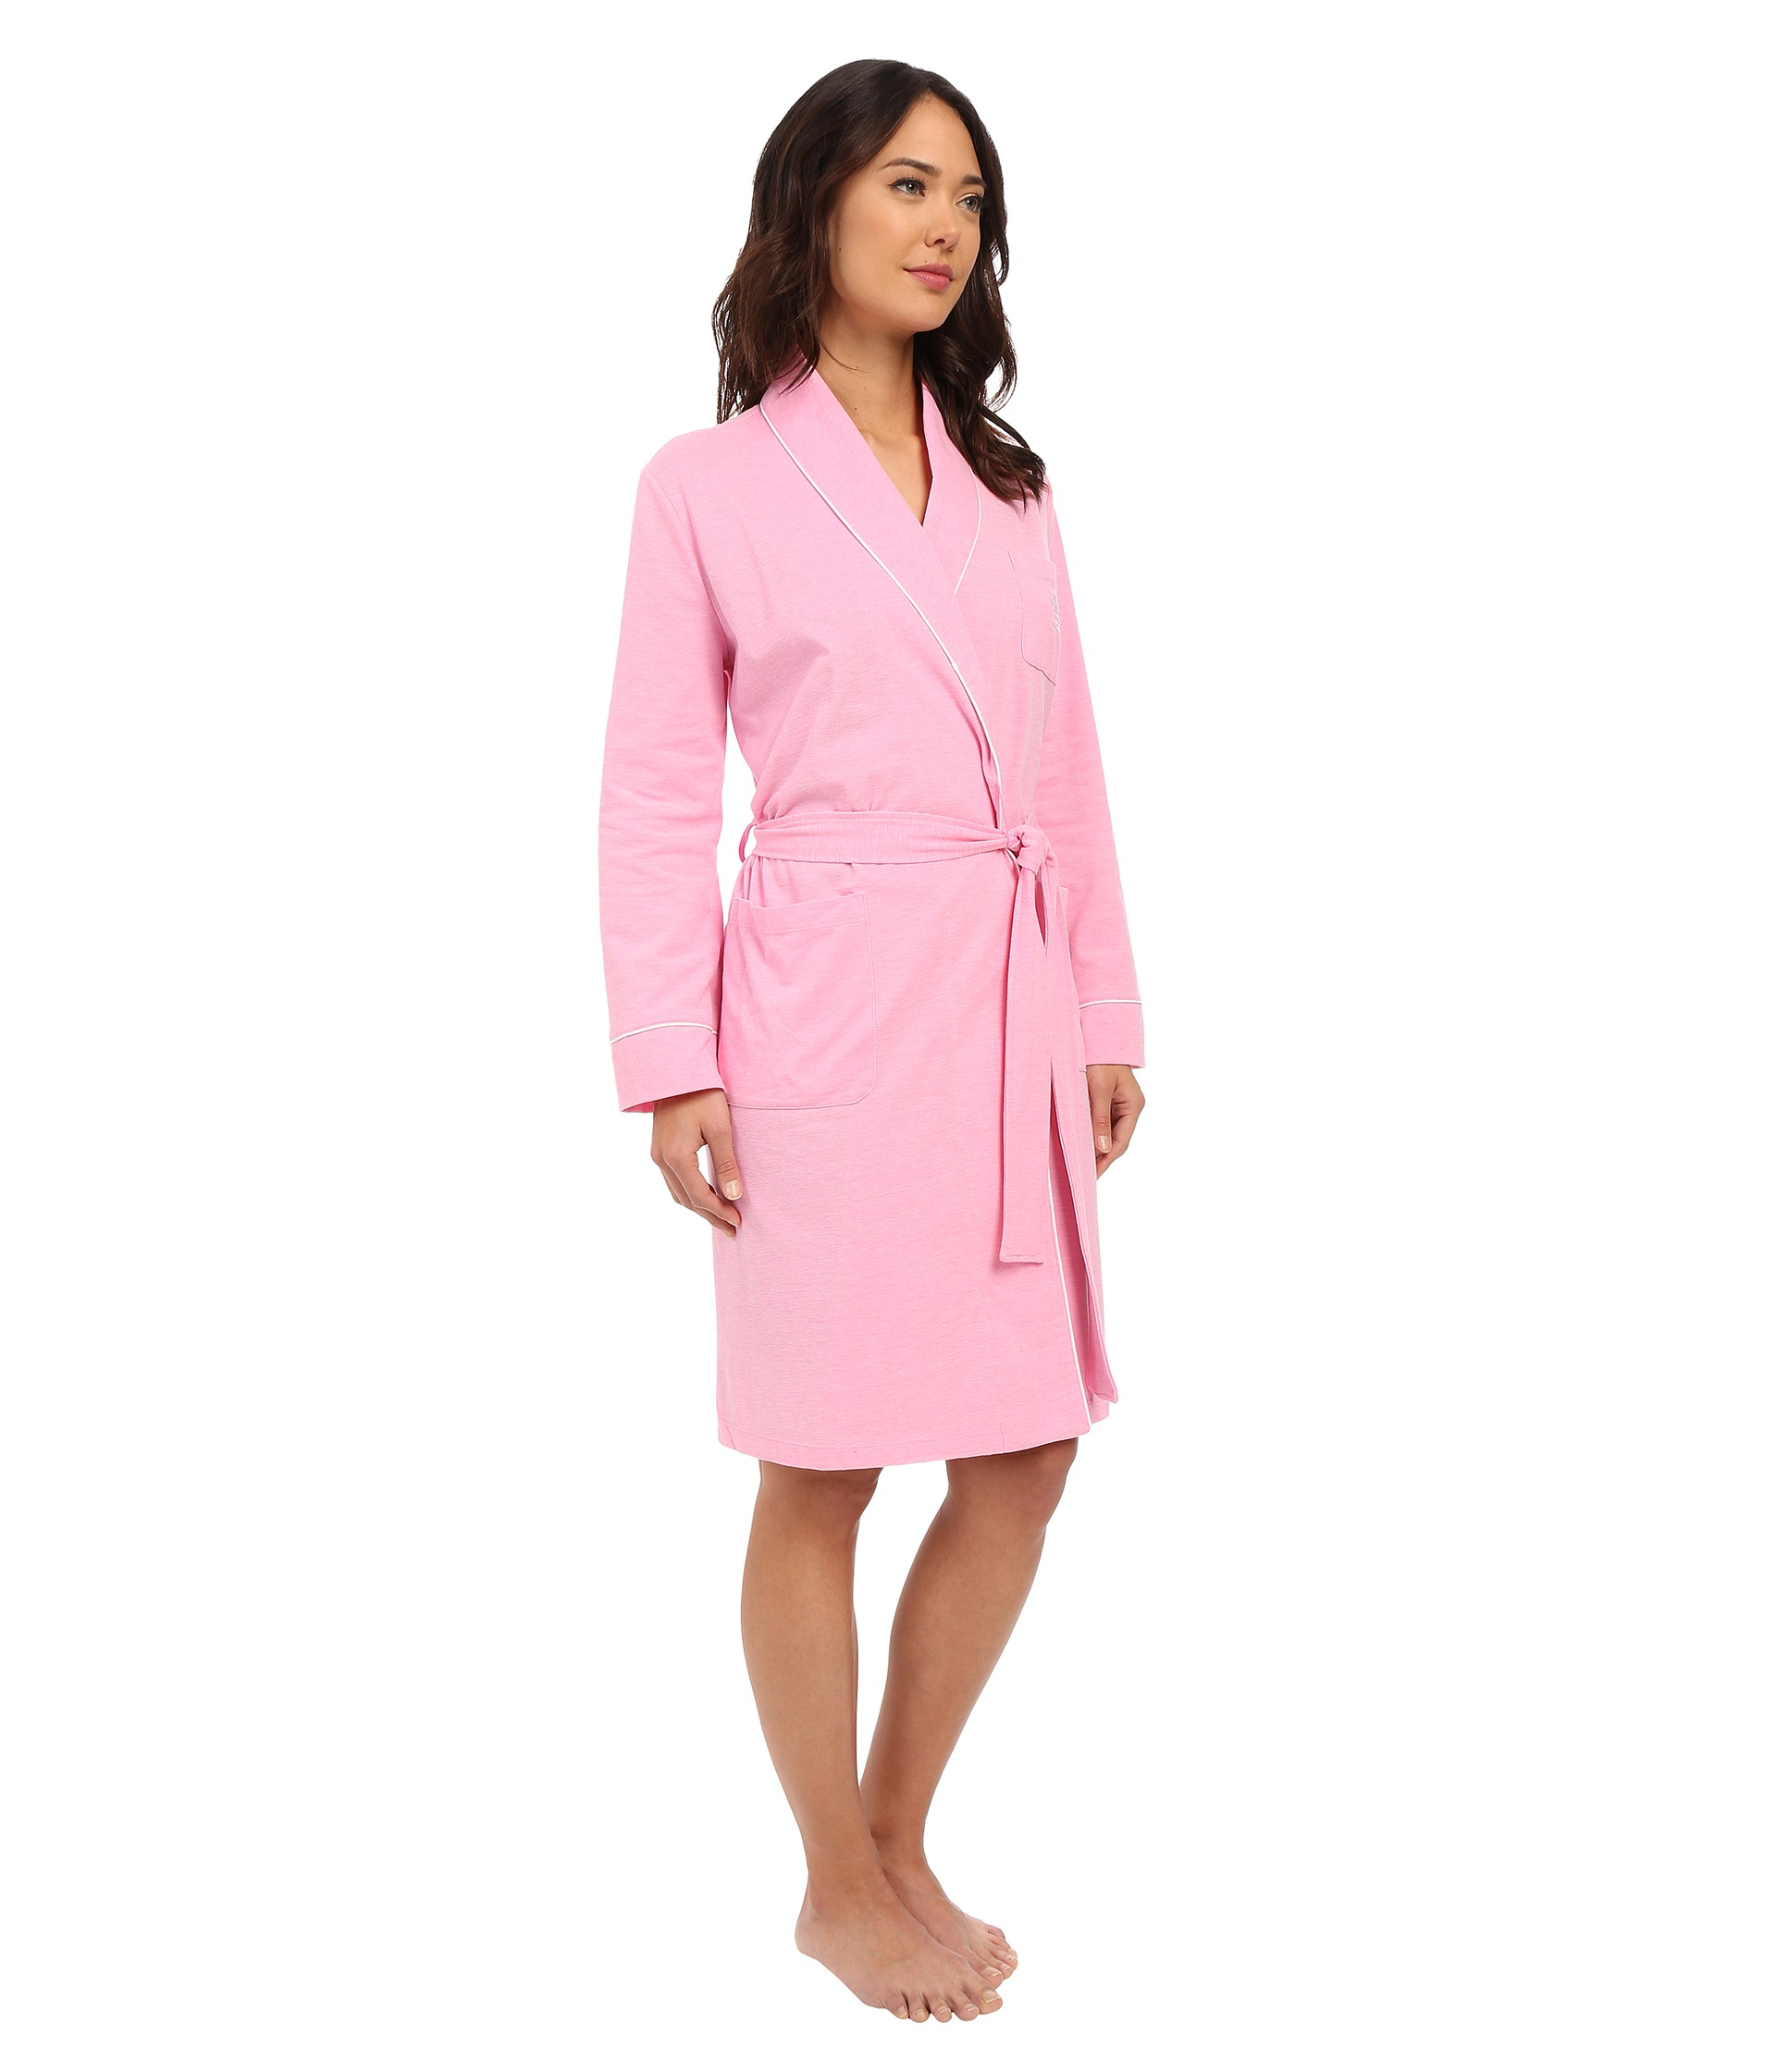 lauren ralph lauren pique robe free shipping both ways. Black Bedroom Furniture Sets. Home Design Ideas